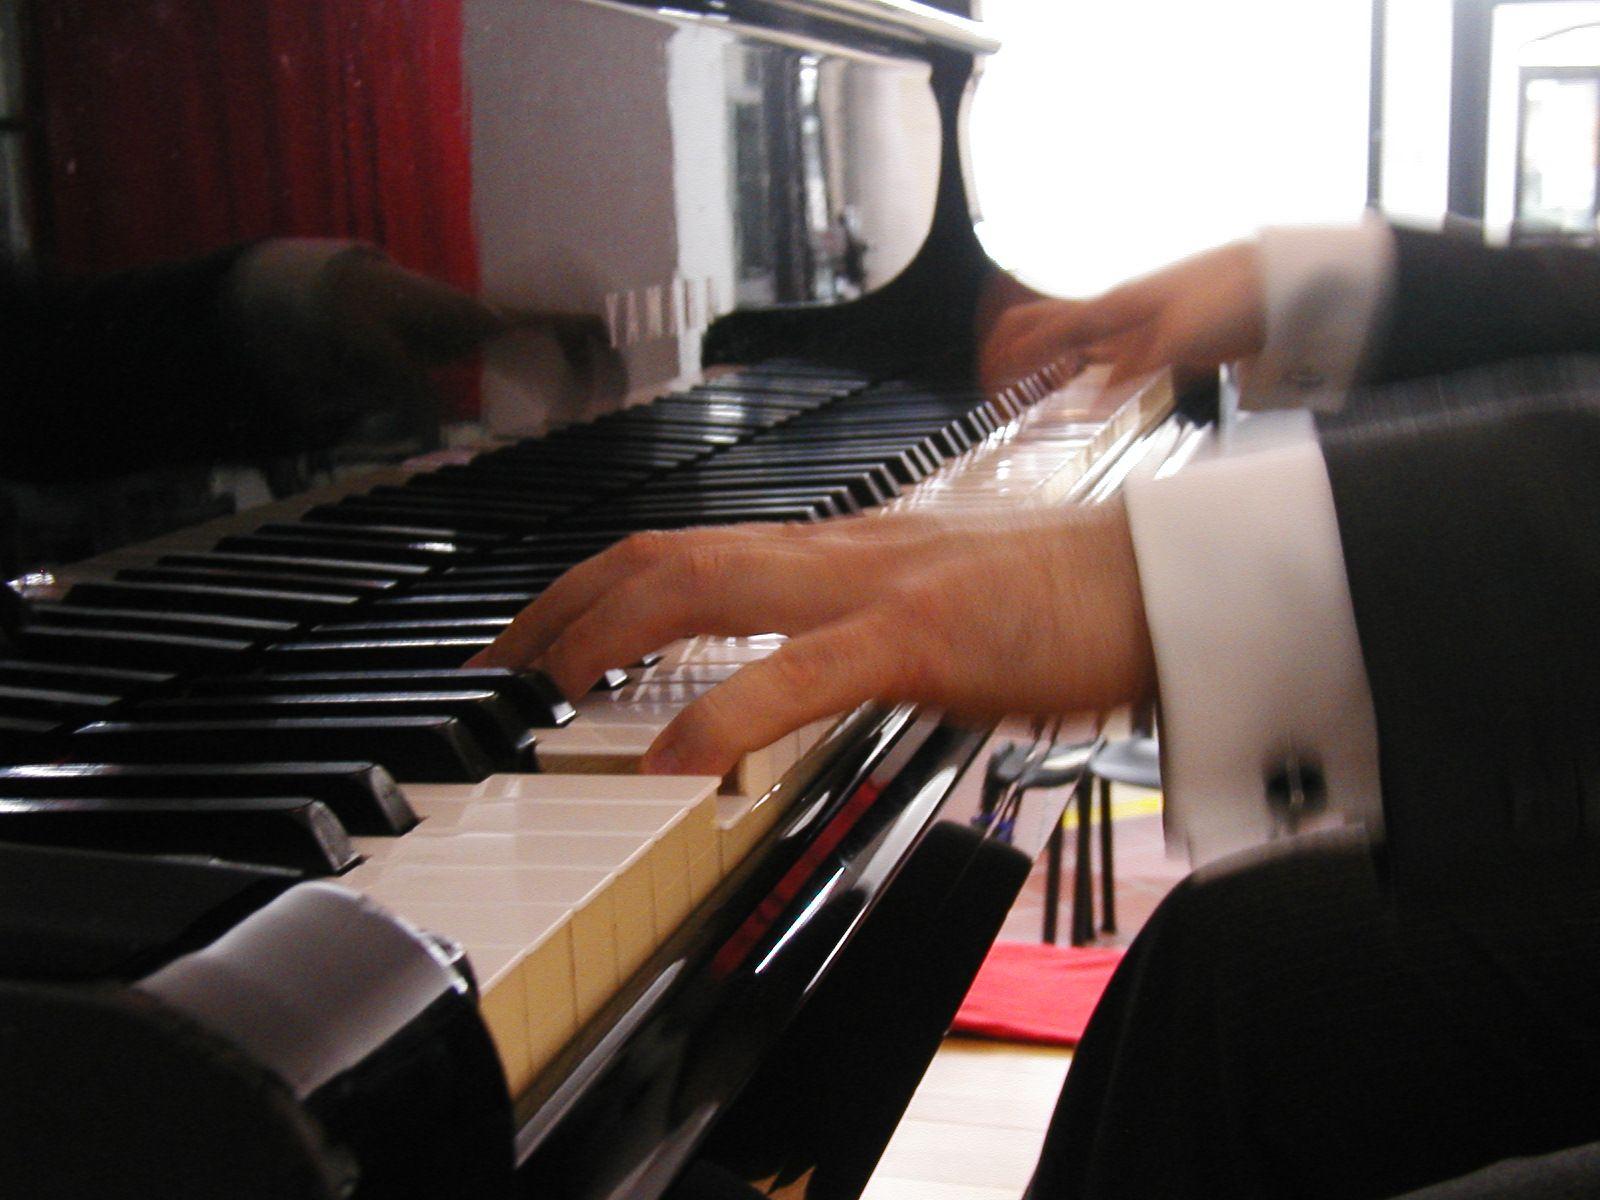 Malavasi, Massimo: Sonata N°2 op. 7